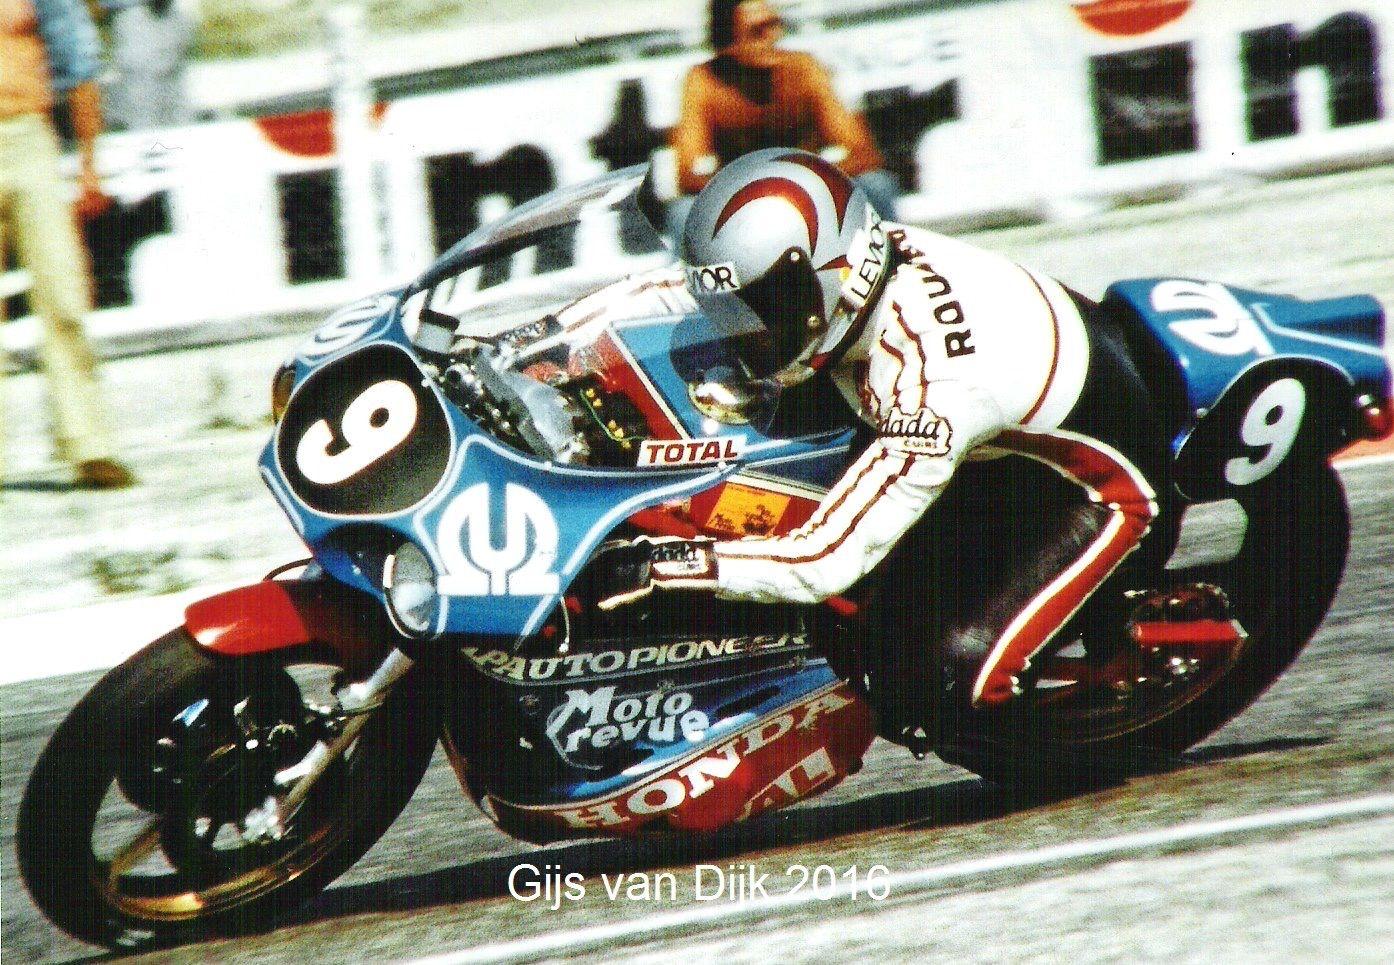 Michel rougerie japauto honda bol d 39 or 1978 endurance for Garage honda montlhery